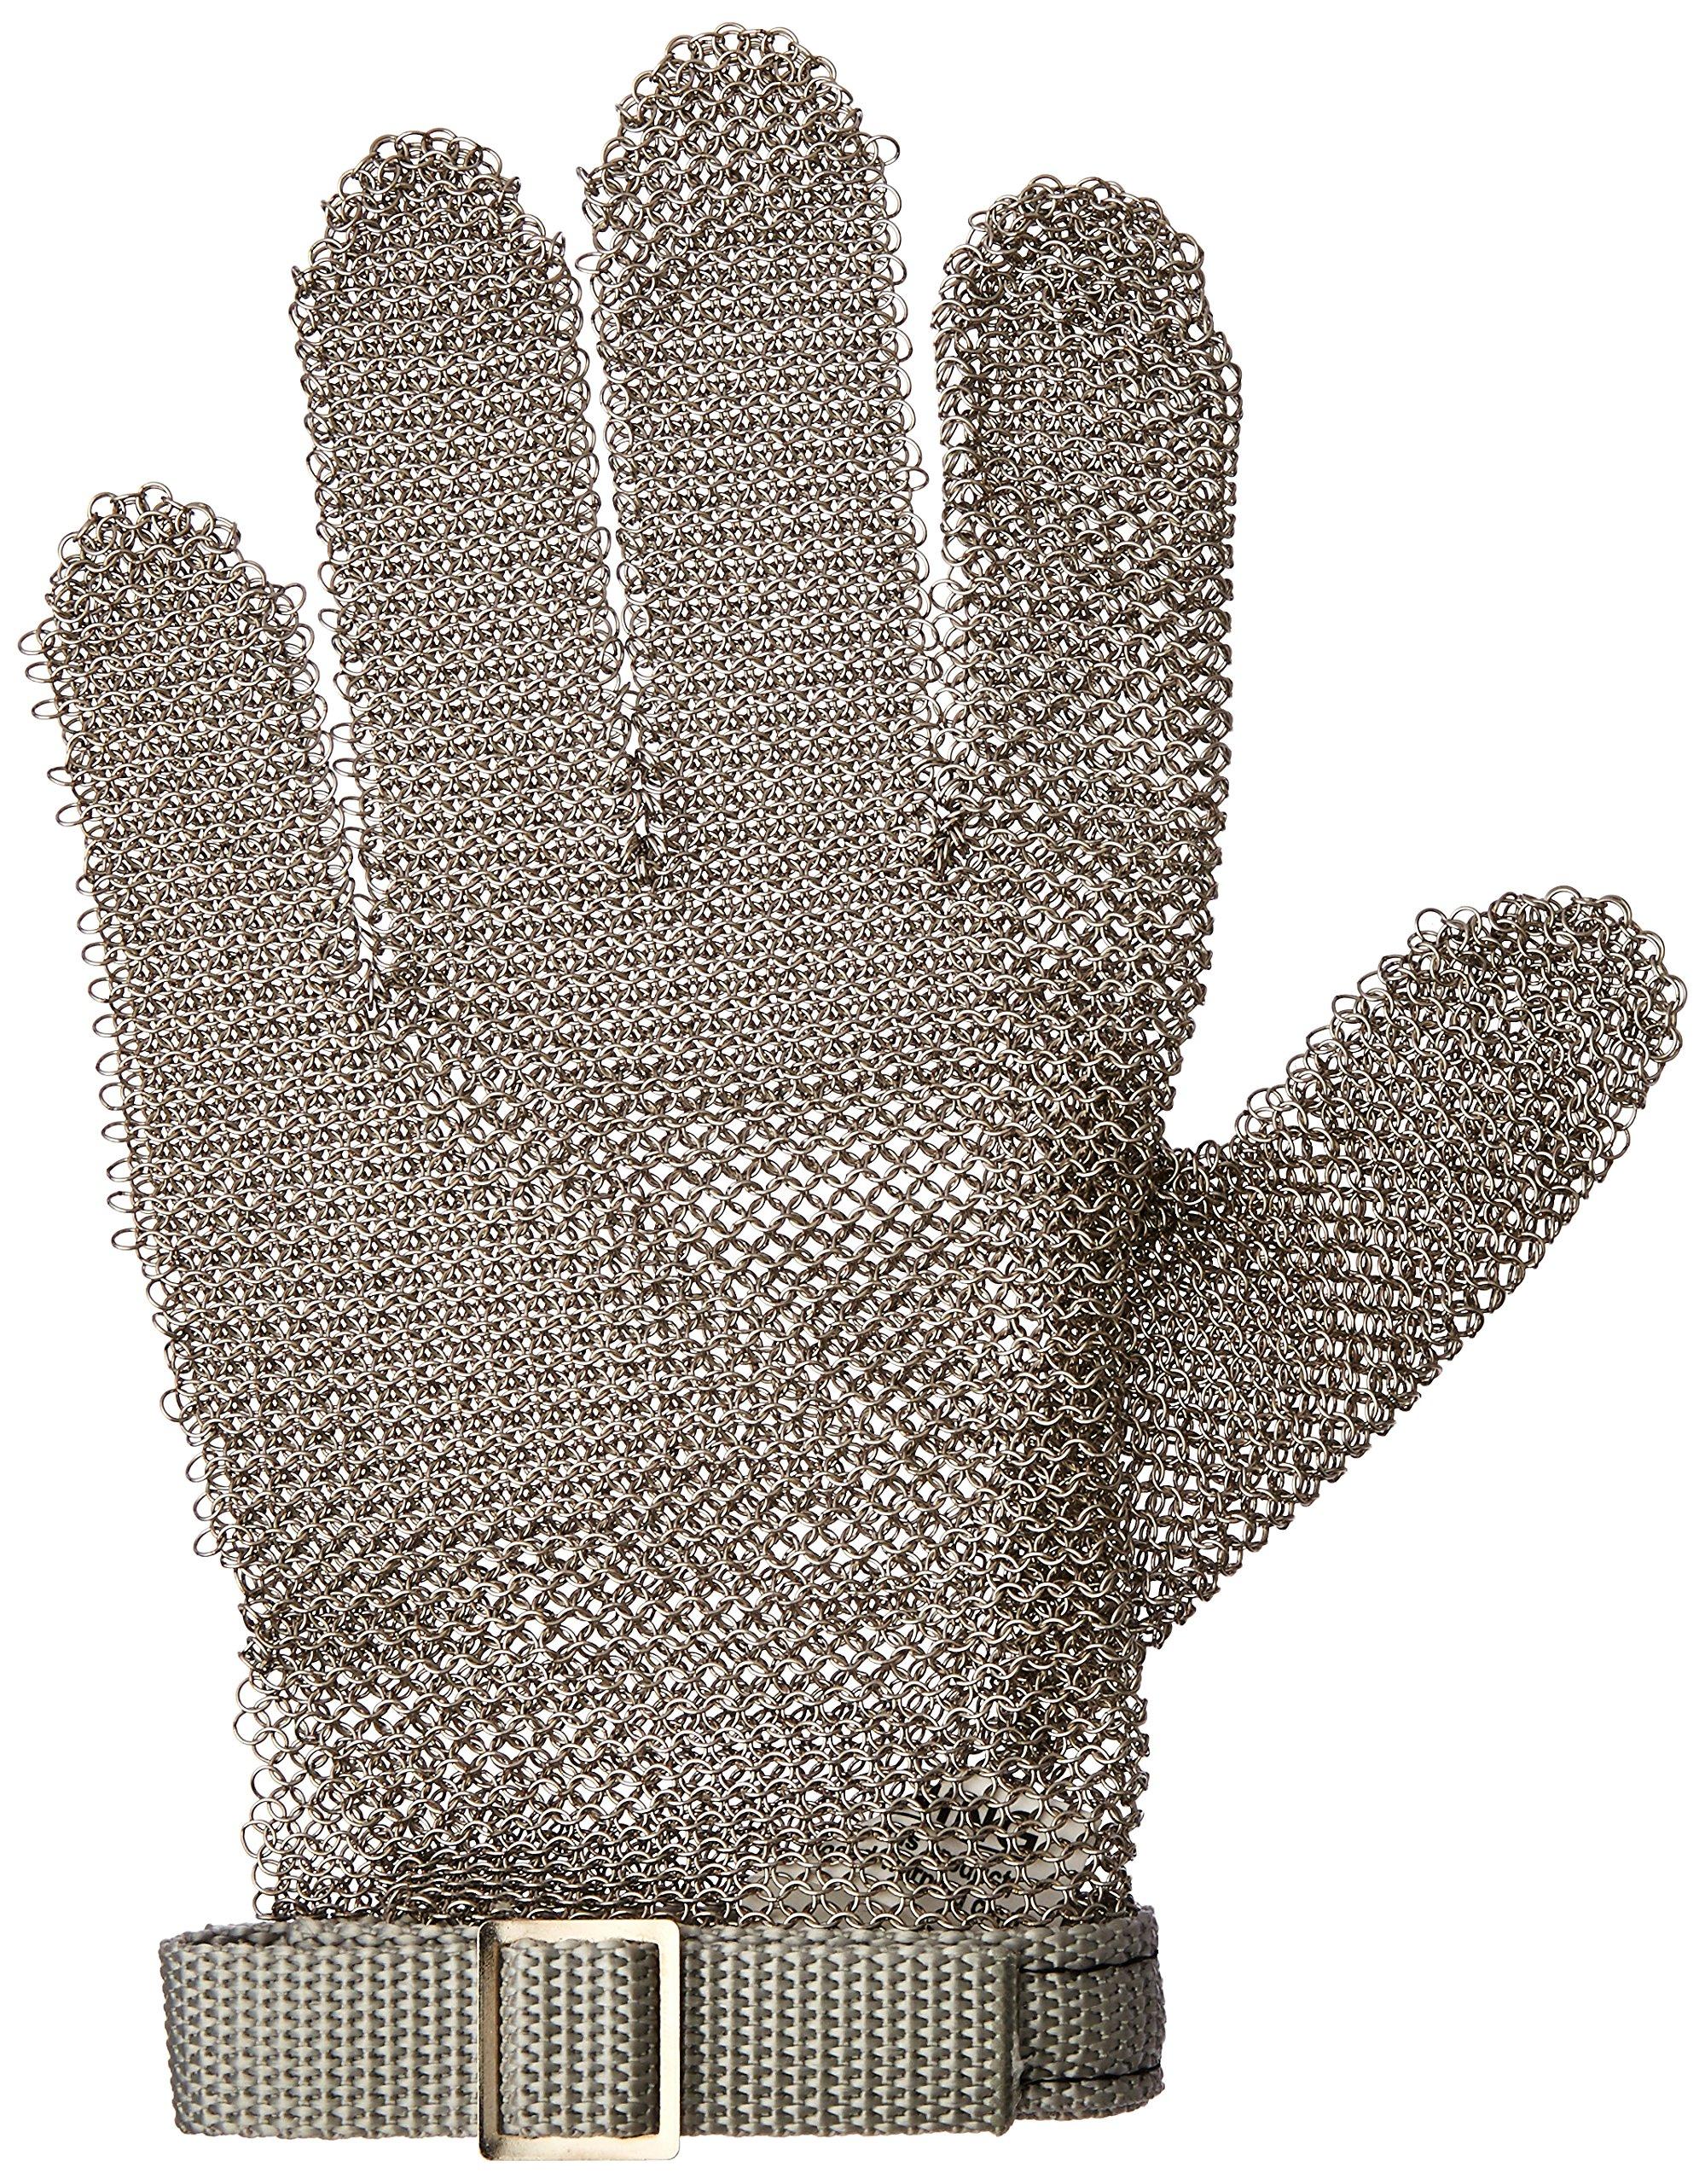 San Jamar MGA515XS Steel Mesh 5 Finger Cut-Resistant Gloves, X-Small